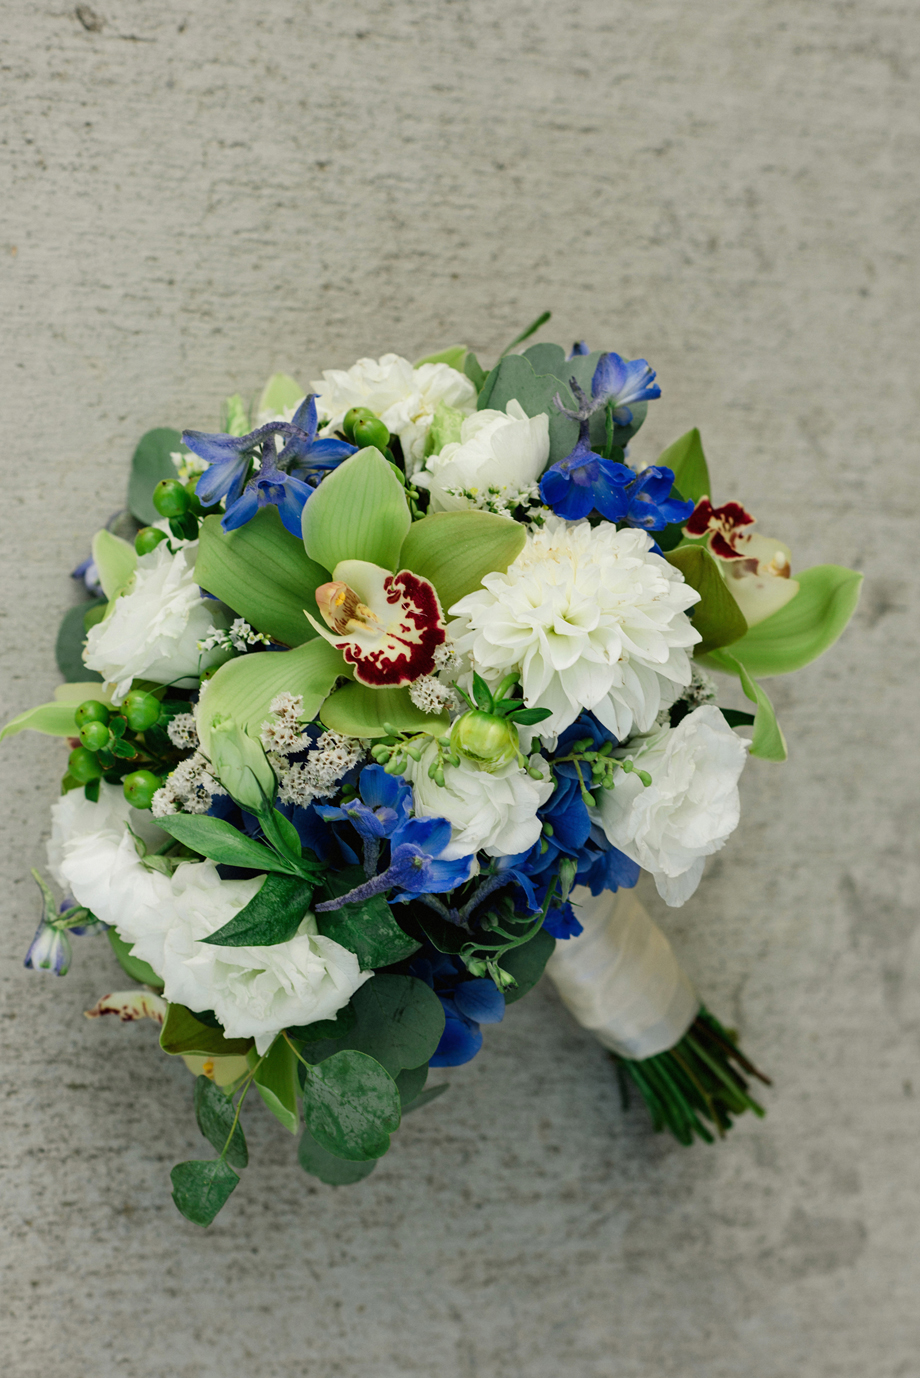 Floral Design by Strelitzia Flower Company